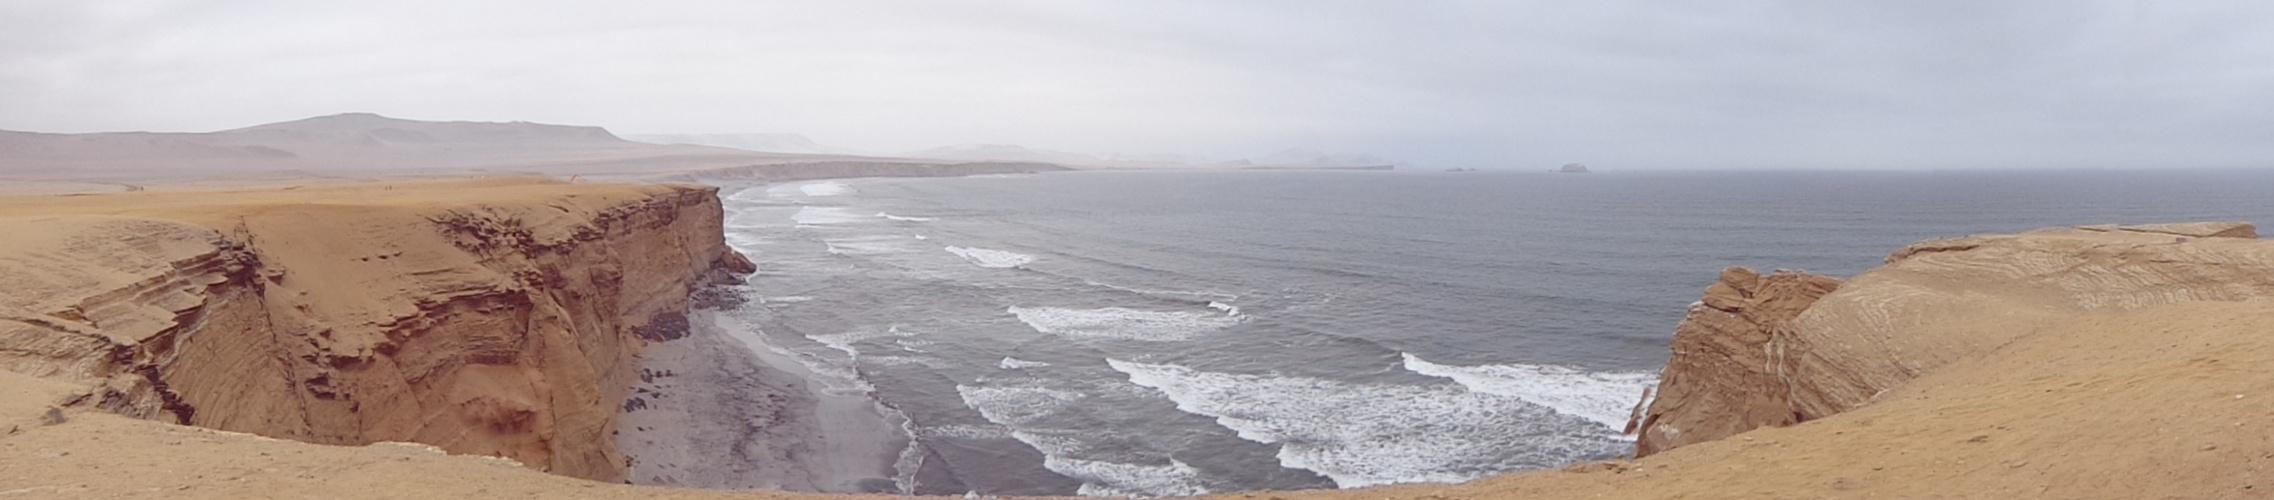 Paracas, playa misteriosa